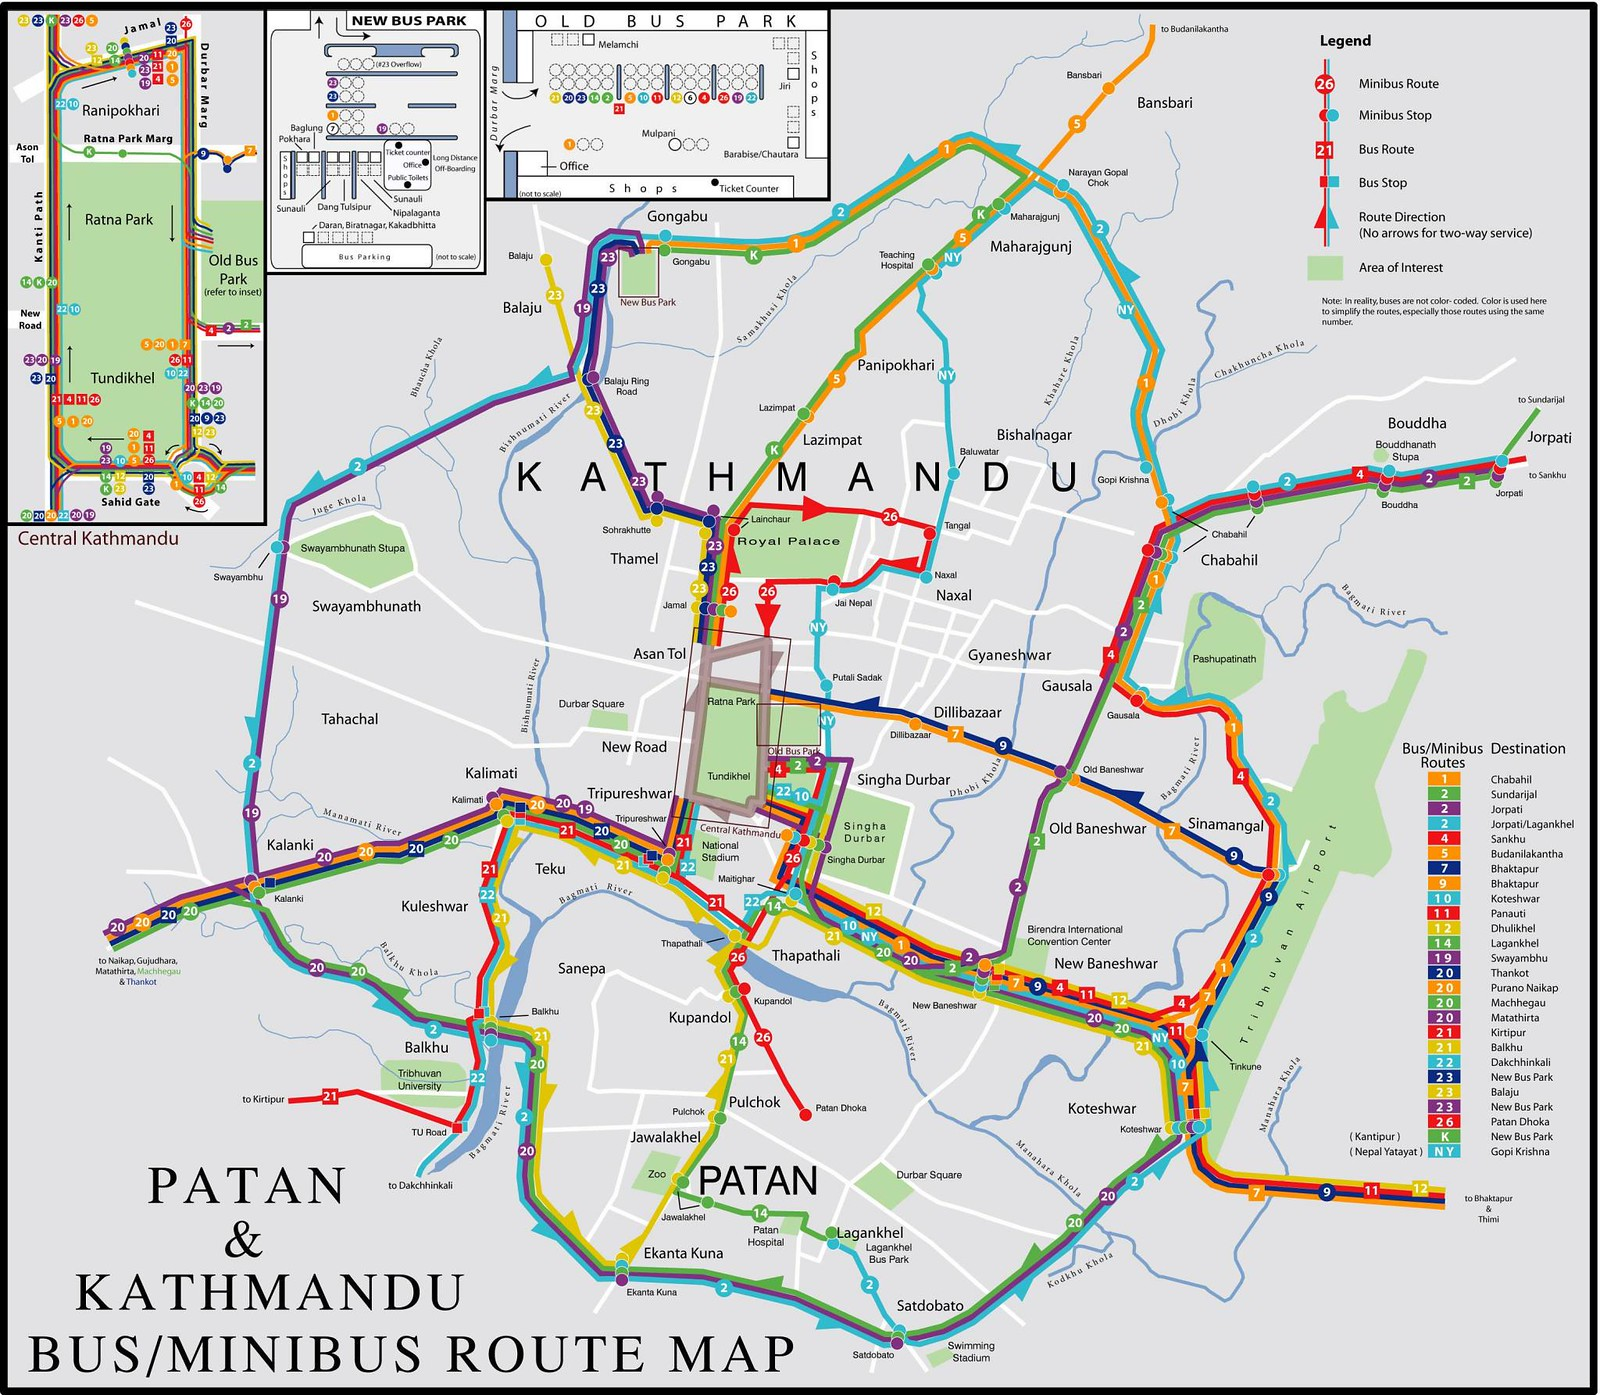 Mapa de autocarros de Kathmandu e Patan, Nepal